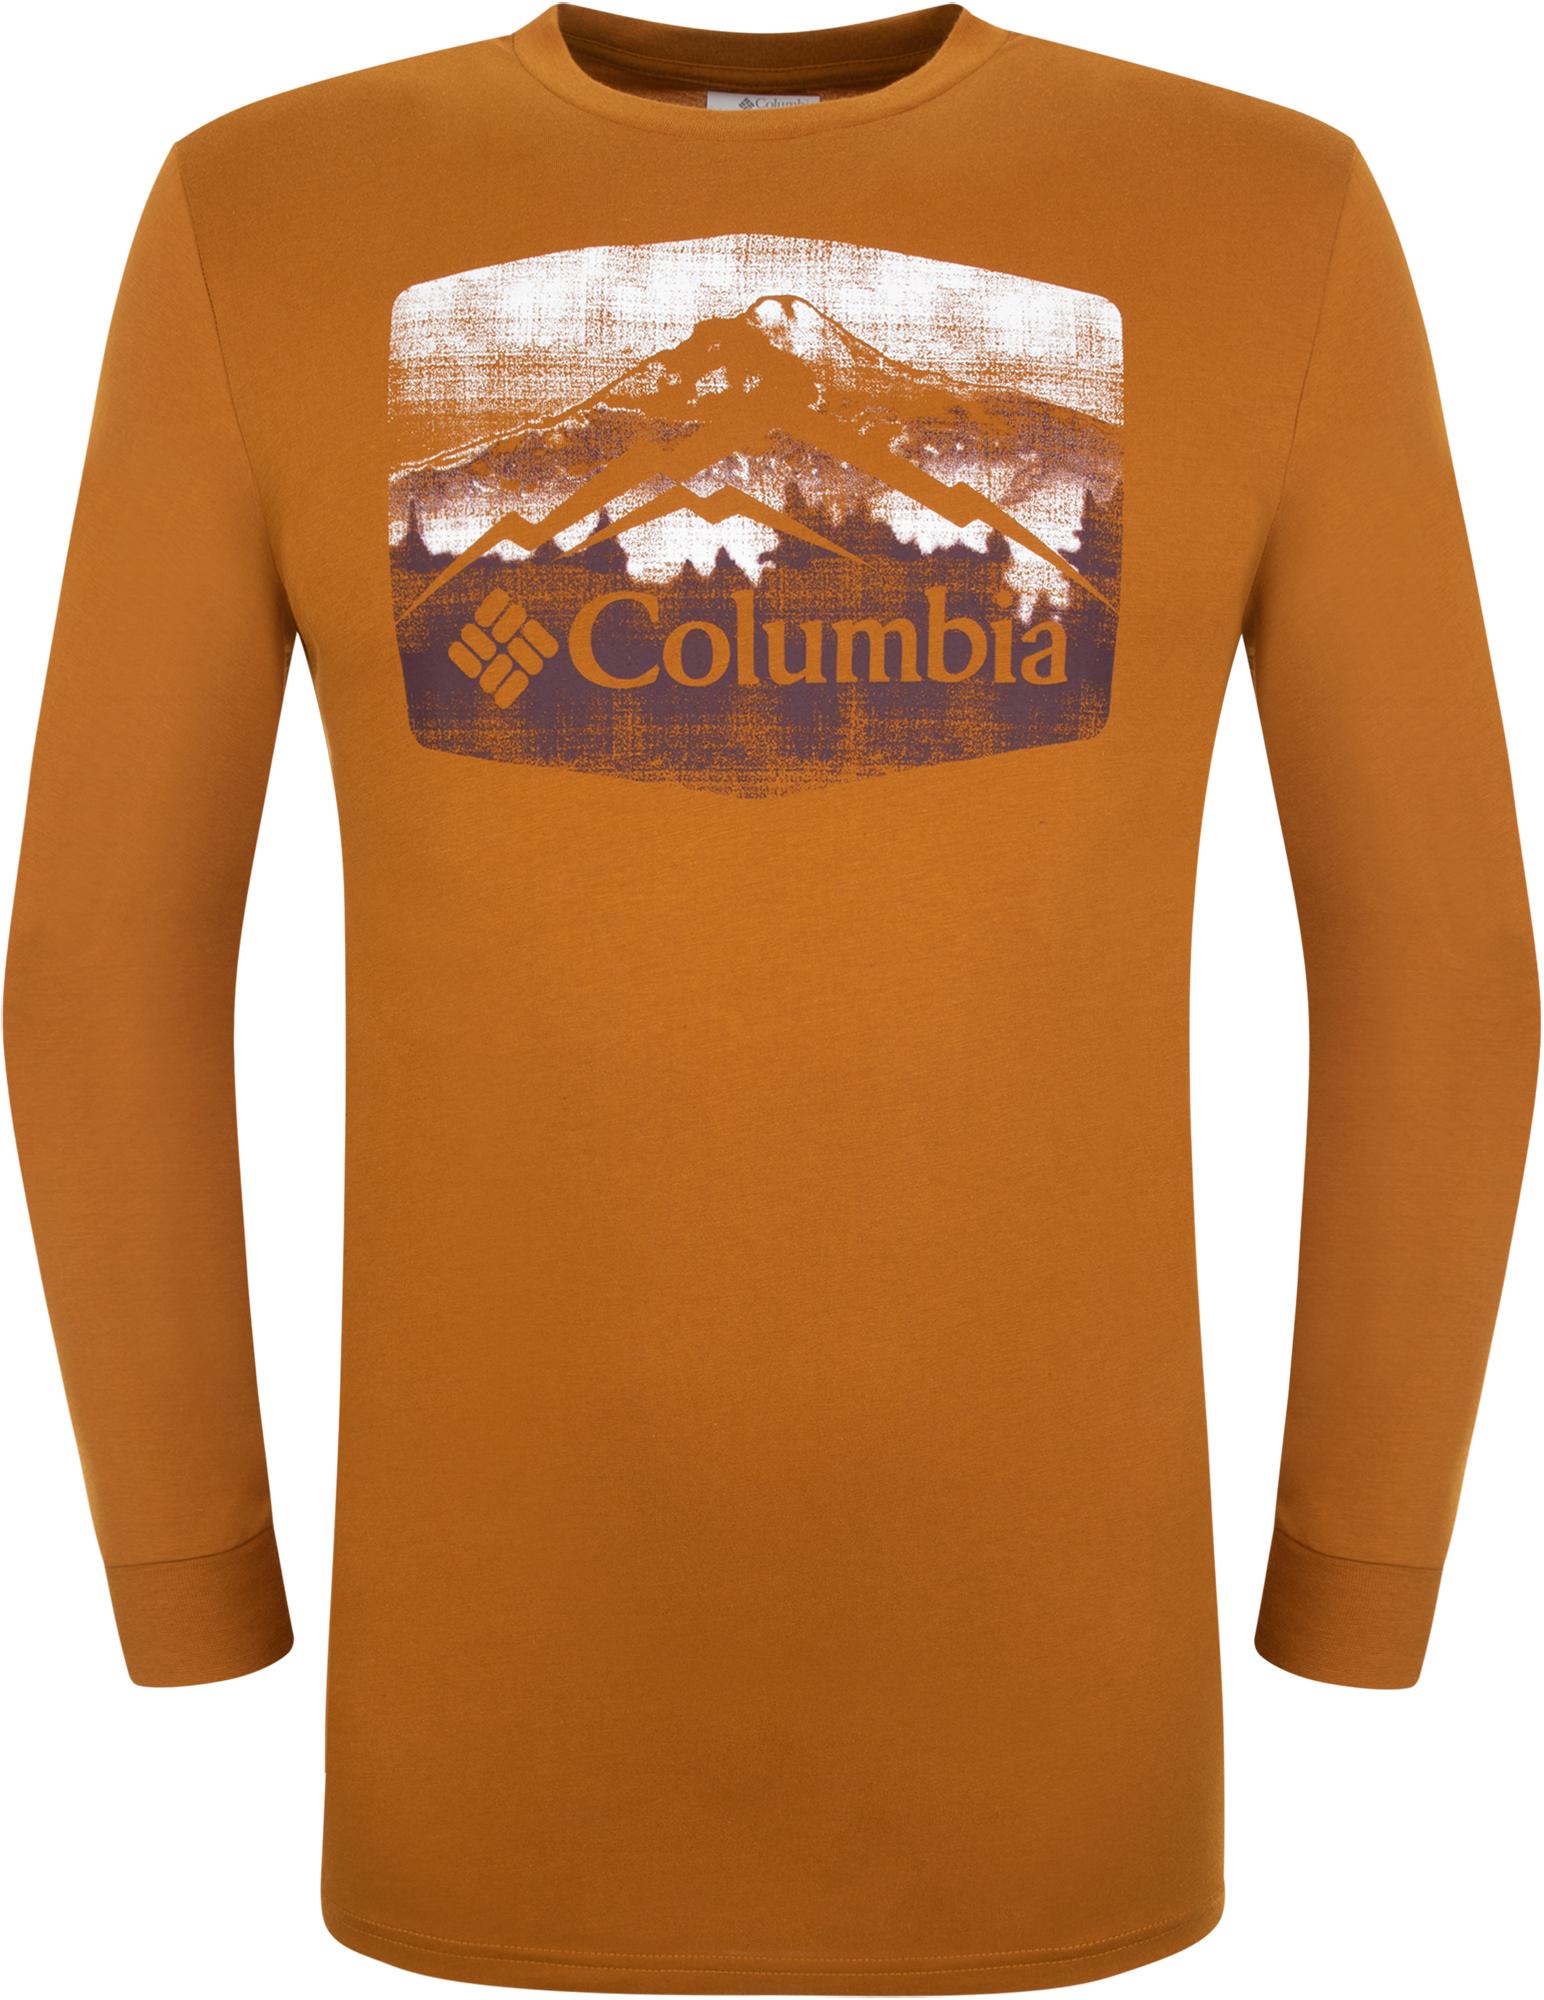 Columbia Футболка с длинным рукавом мужская Columbia Ranger River, размер 56-58 columbia футболка с длинным рукавом мужская columbia lascaux caves